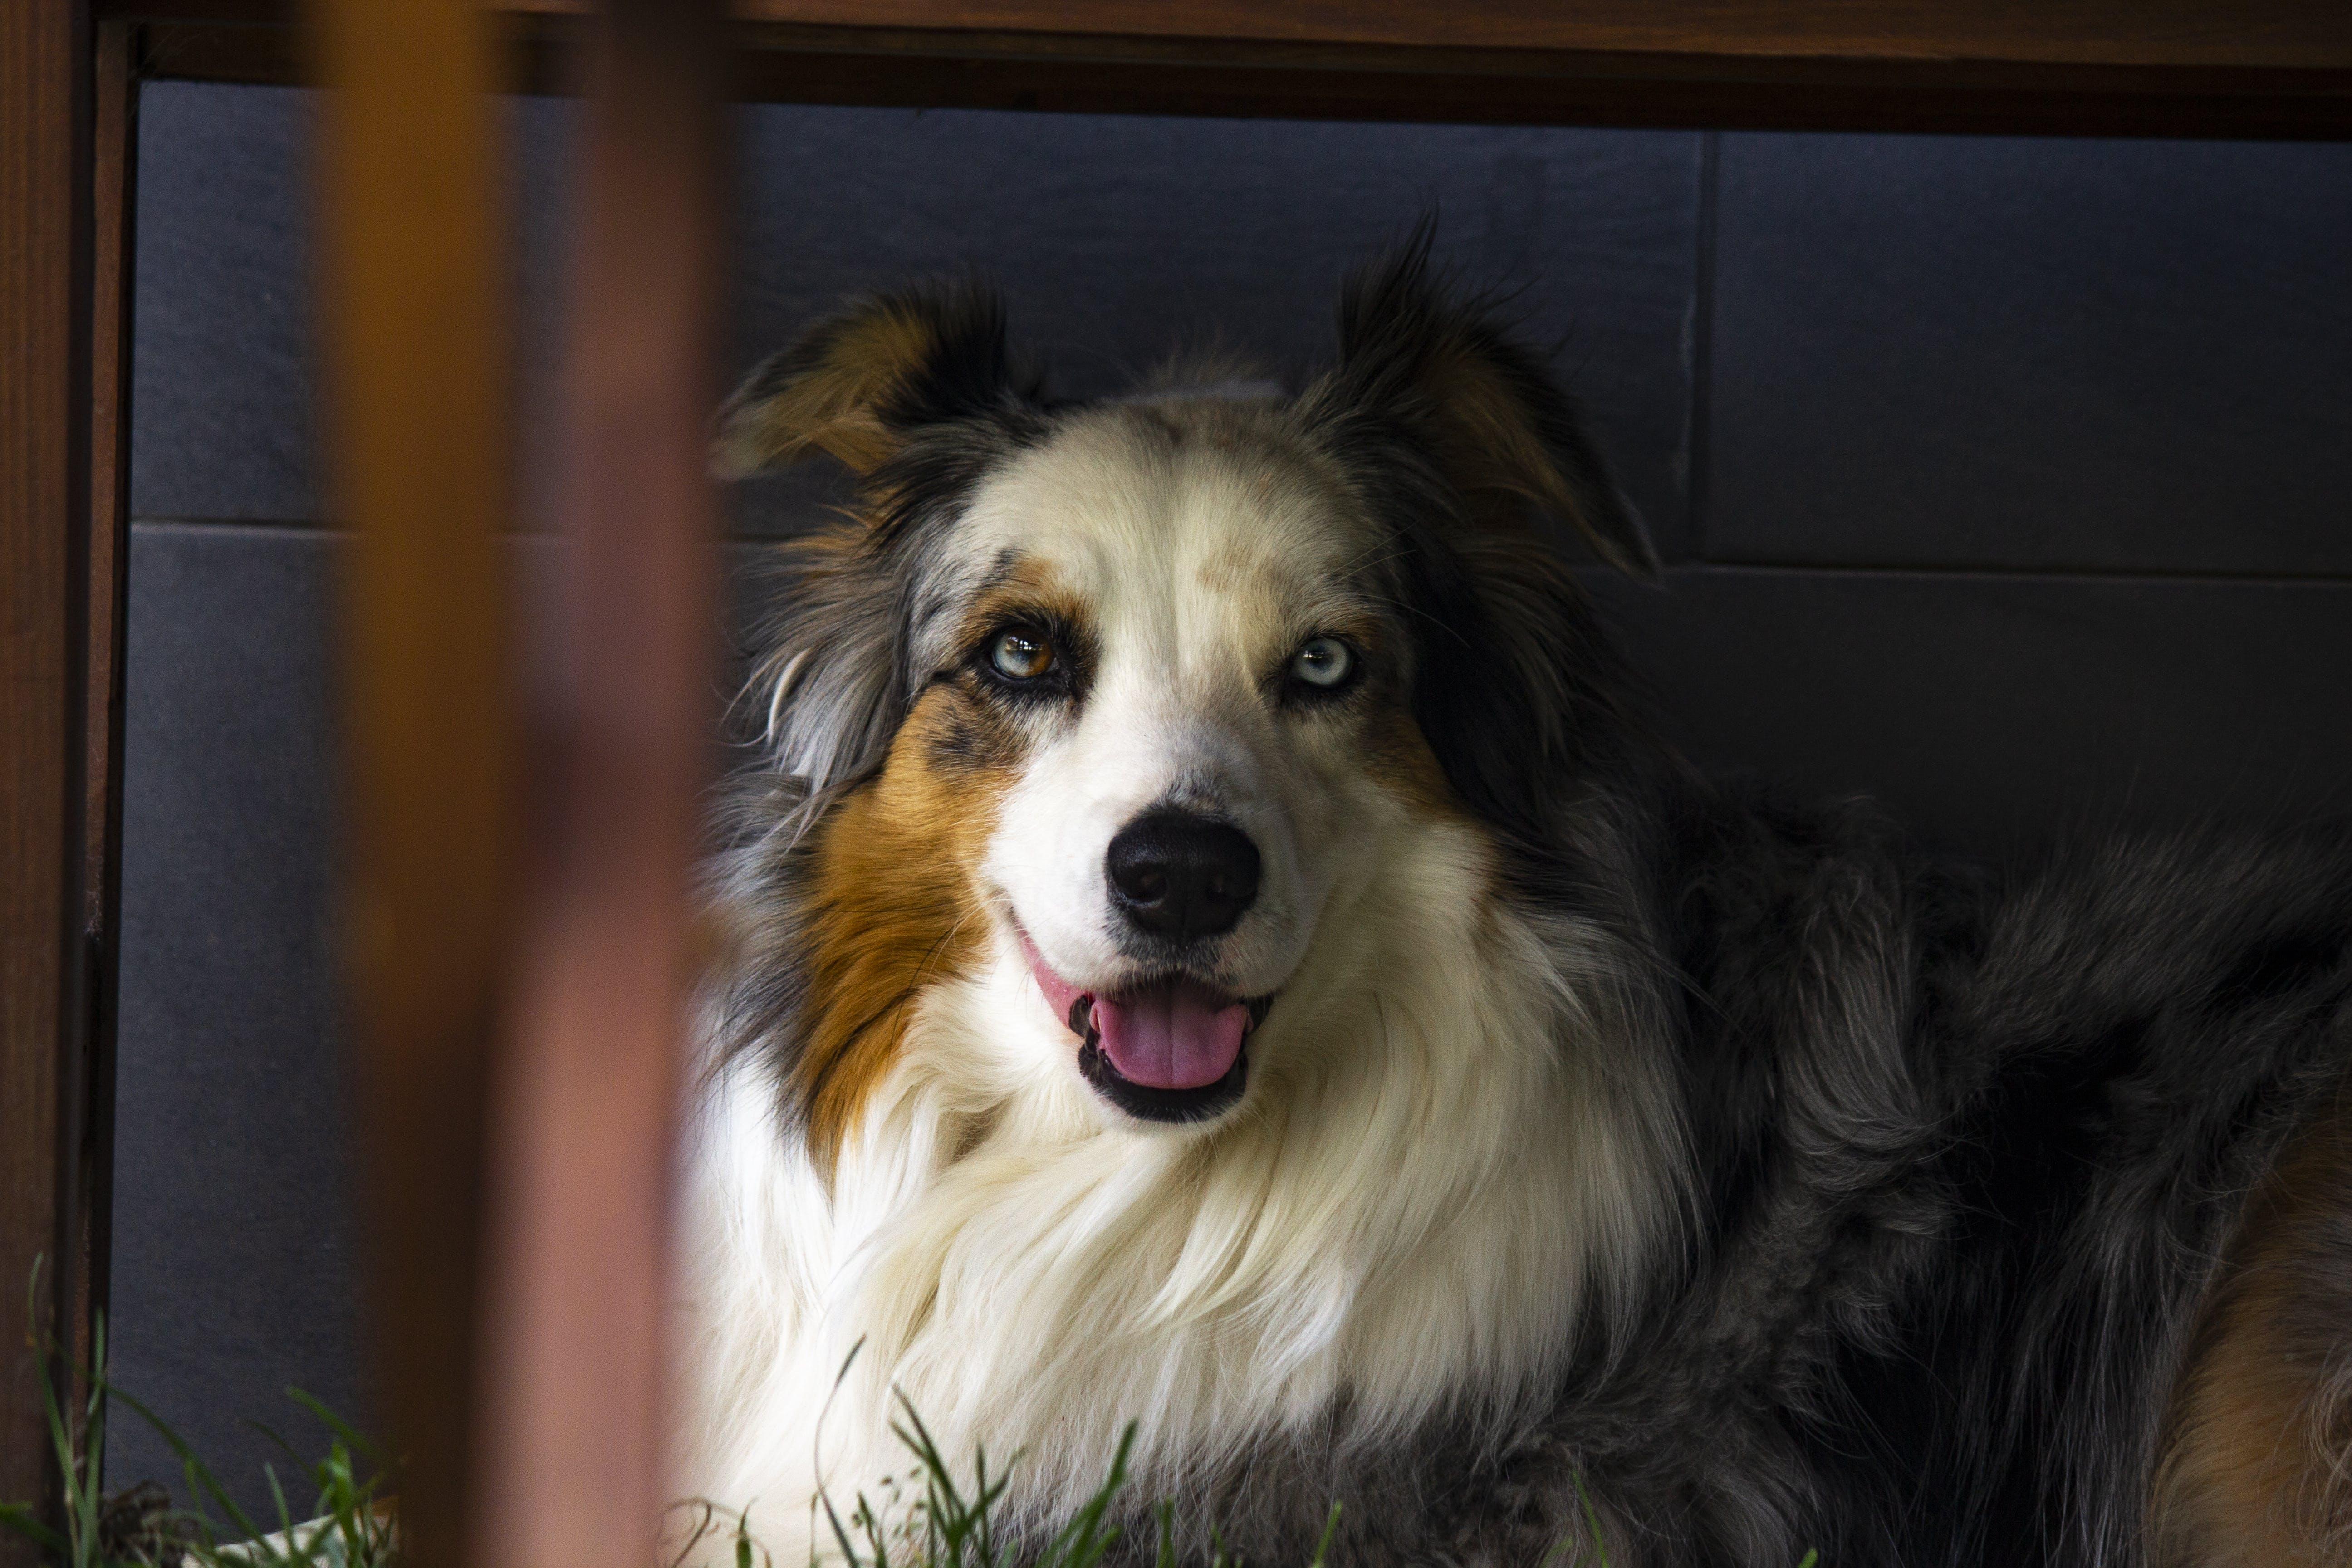 Free stock photo of My dog :)